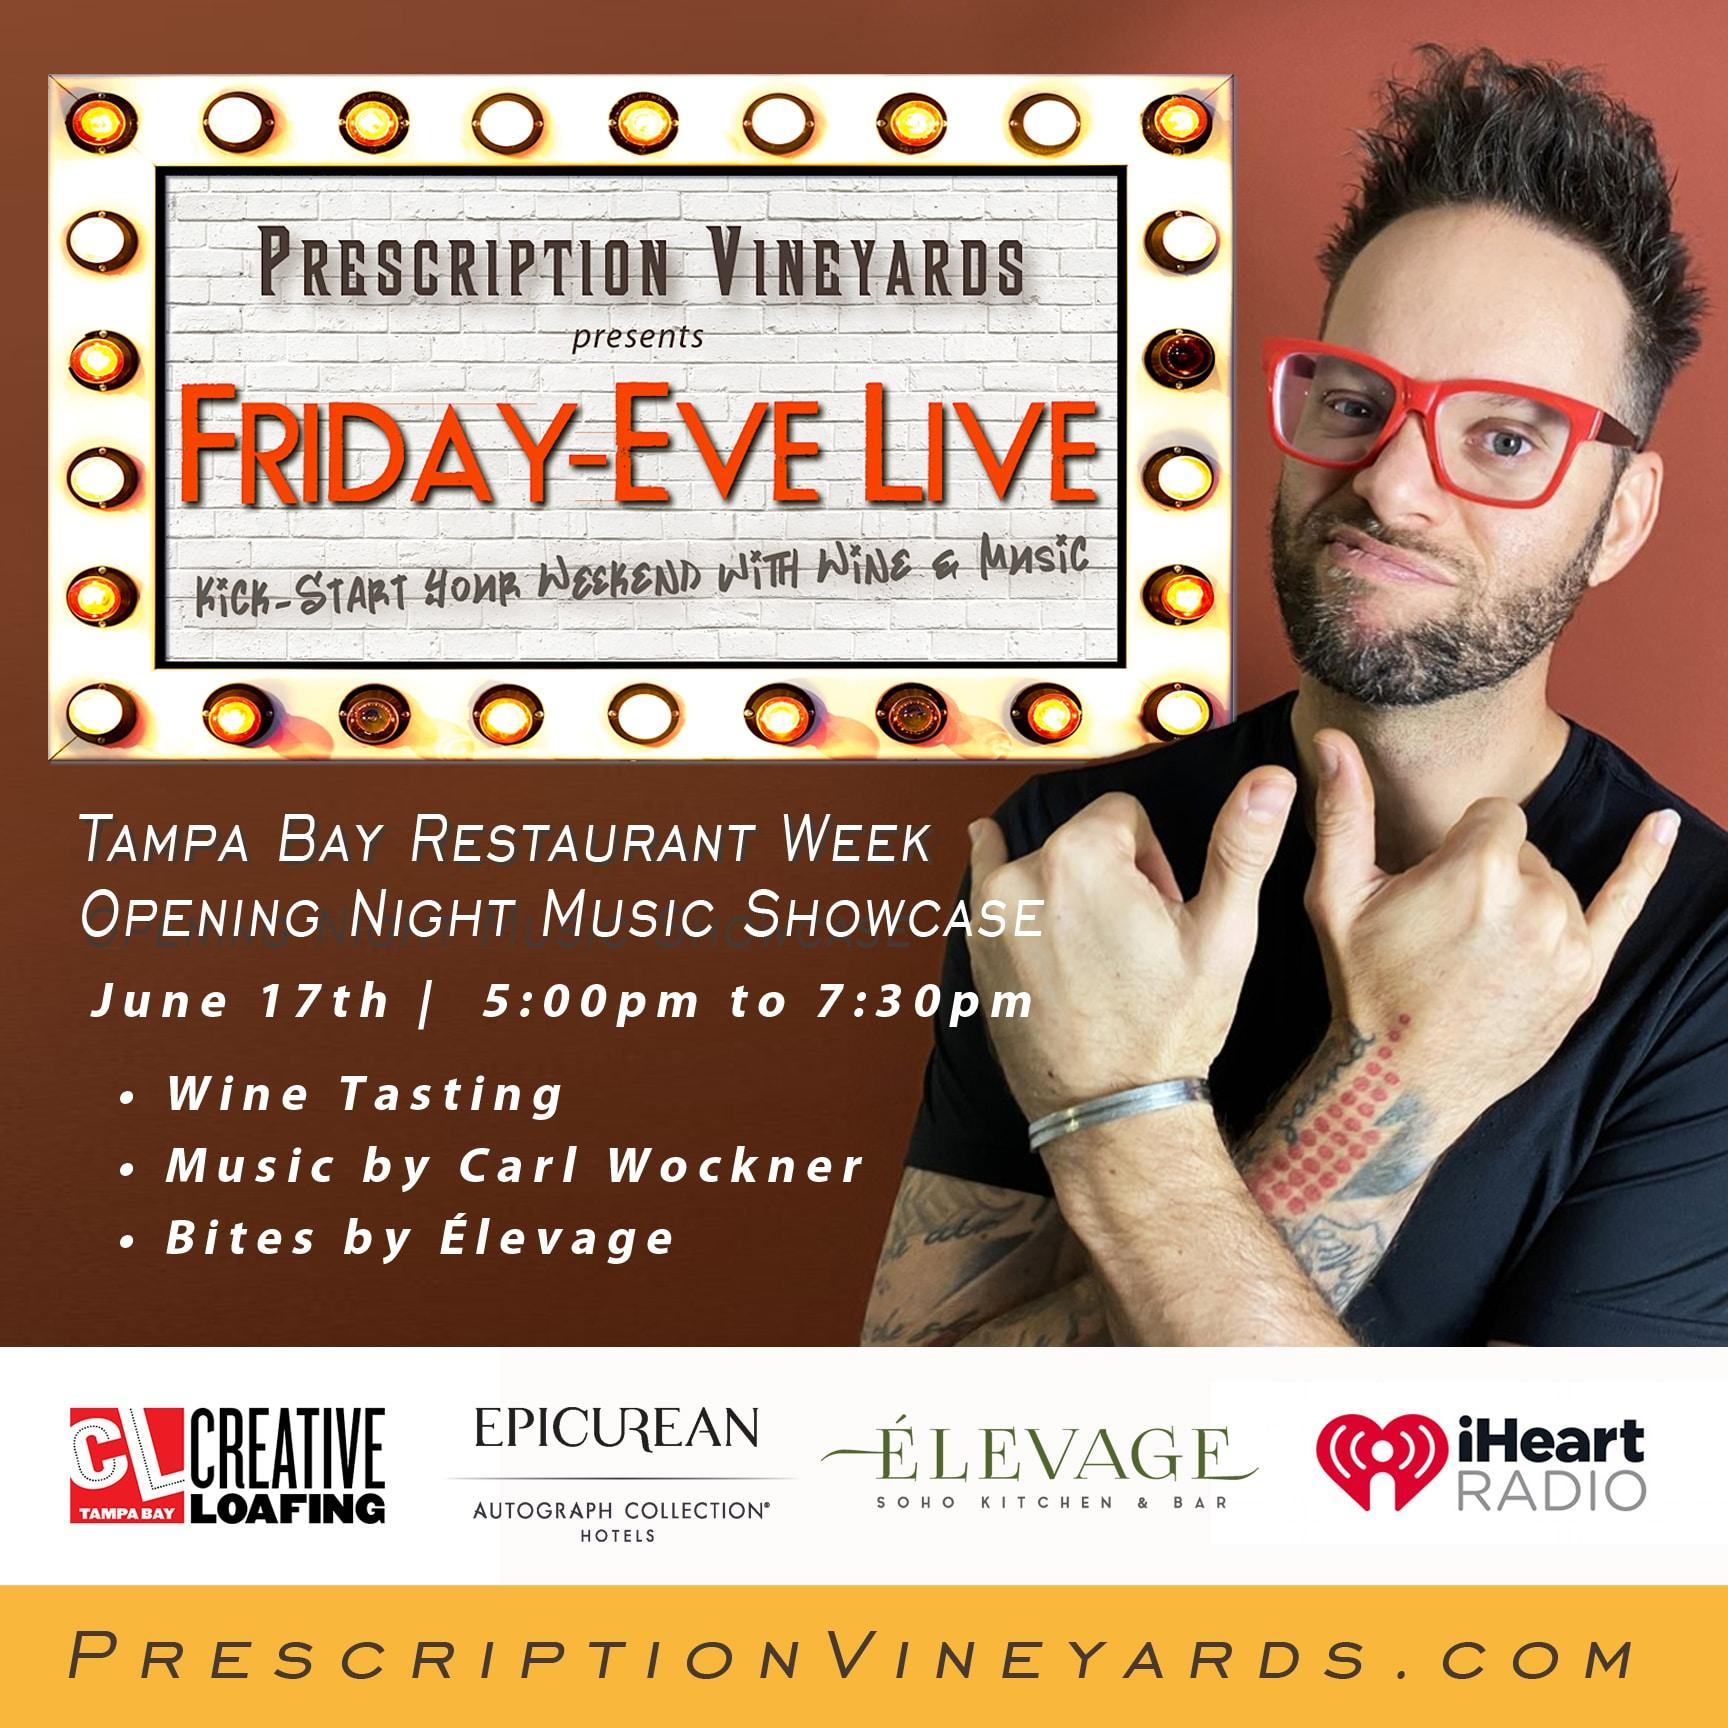 Carl Wockner Headlines Friday-Eve Live in Tampa